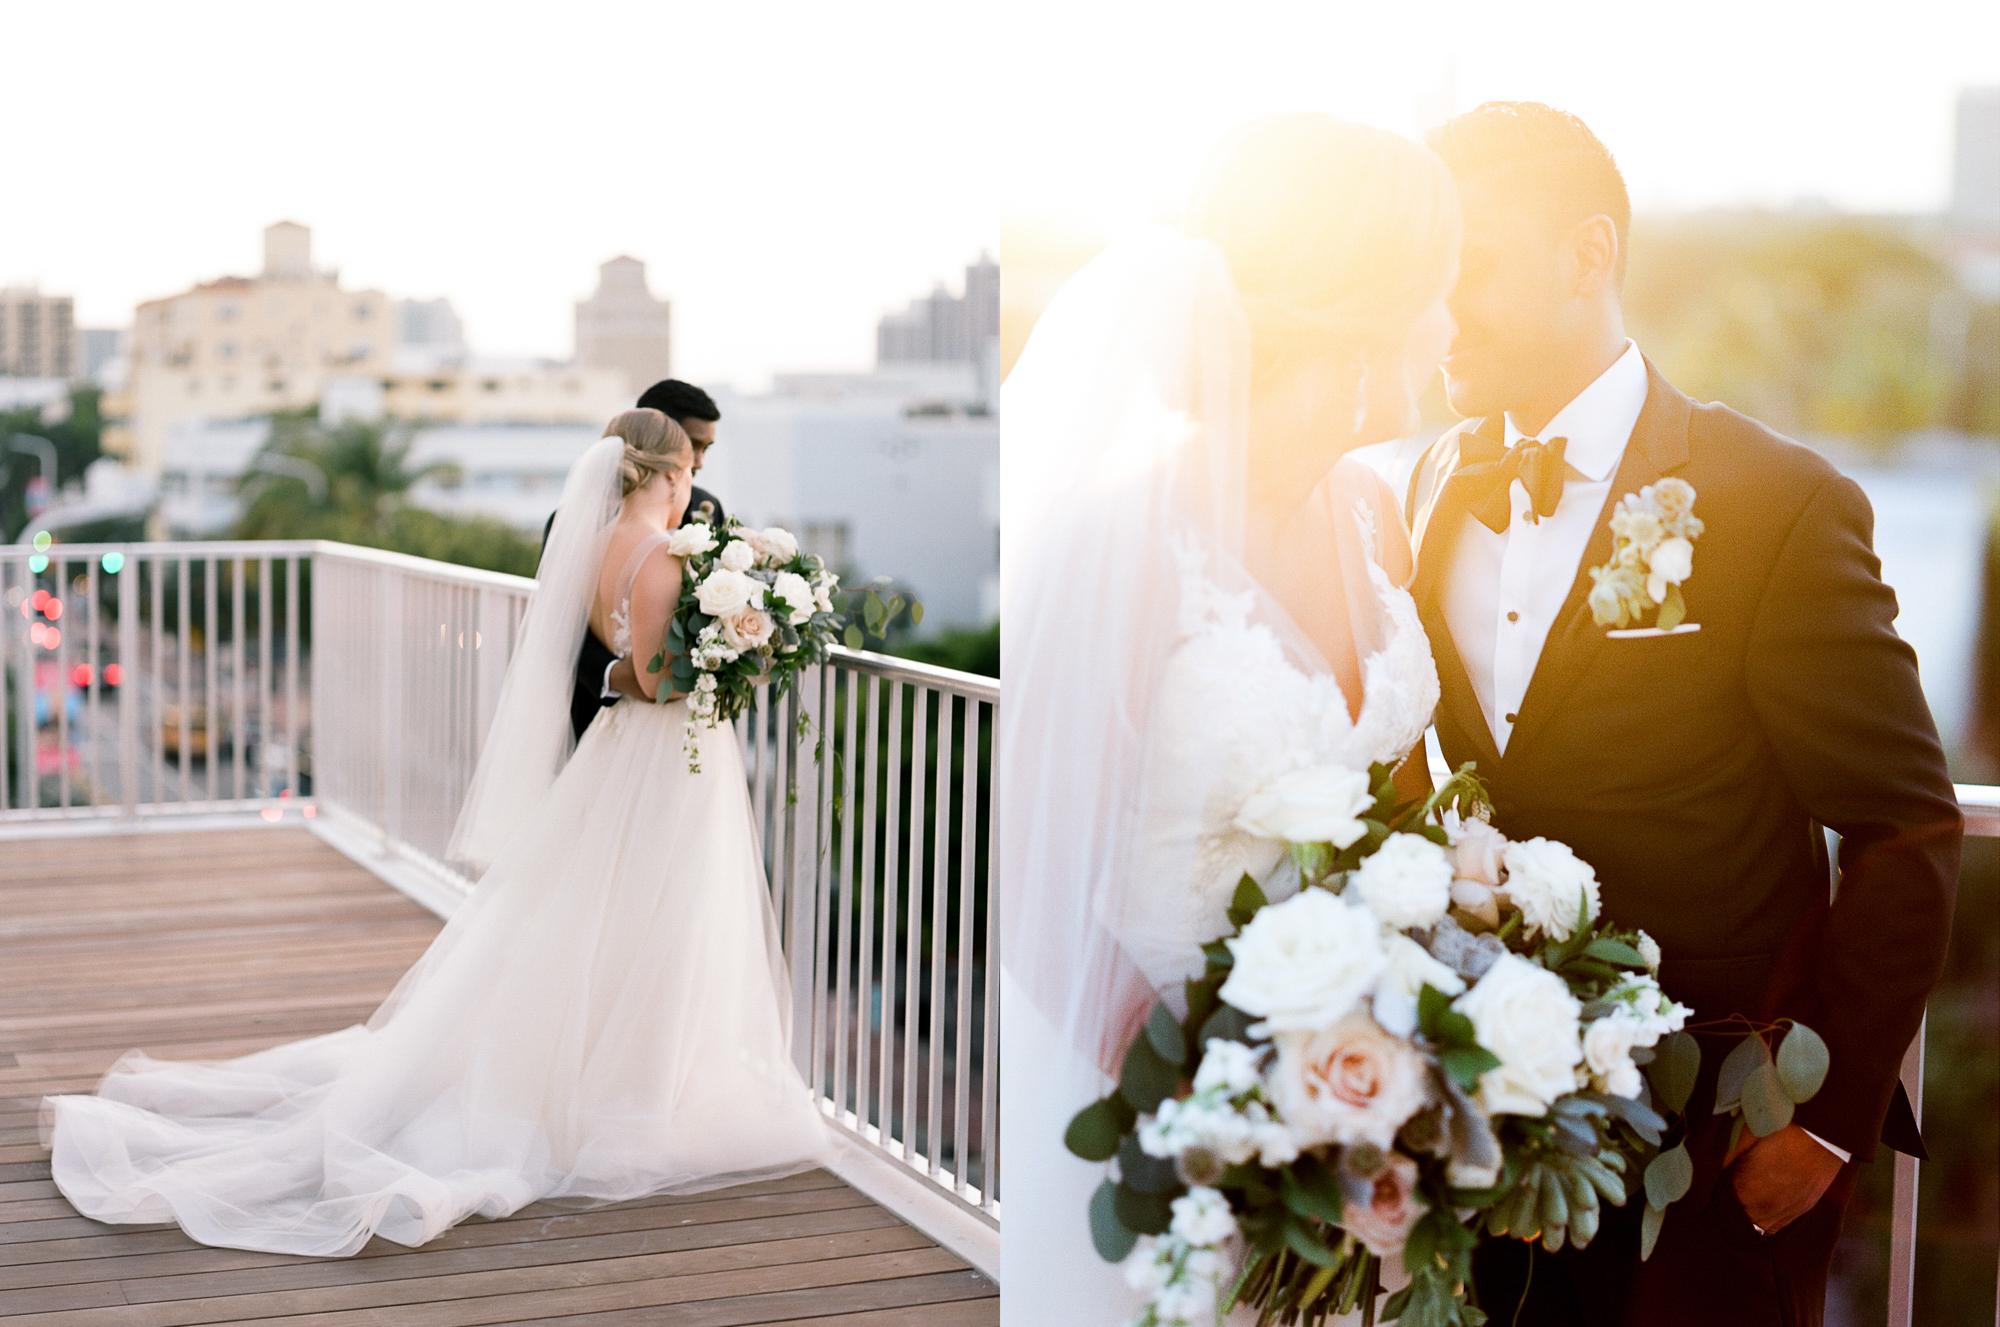 betsy-hotel-wedding-south-beach-miami-charleston-south-carolina-destination-wedding-photographer-24.jpg